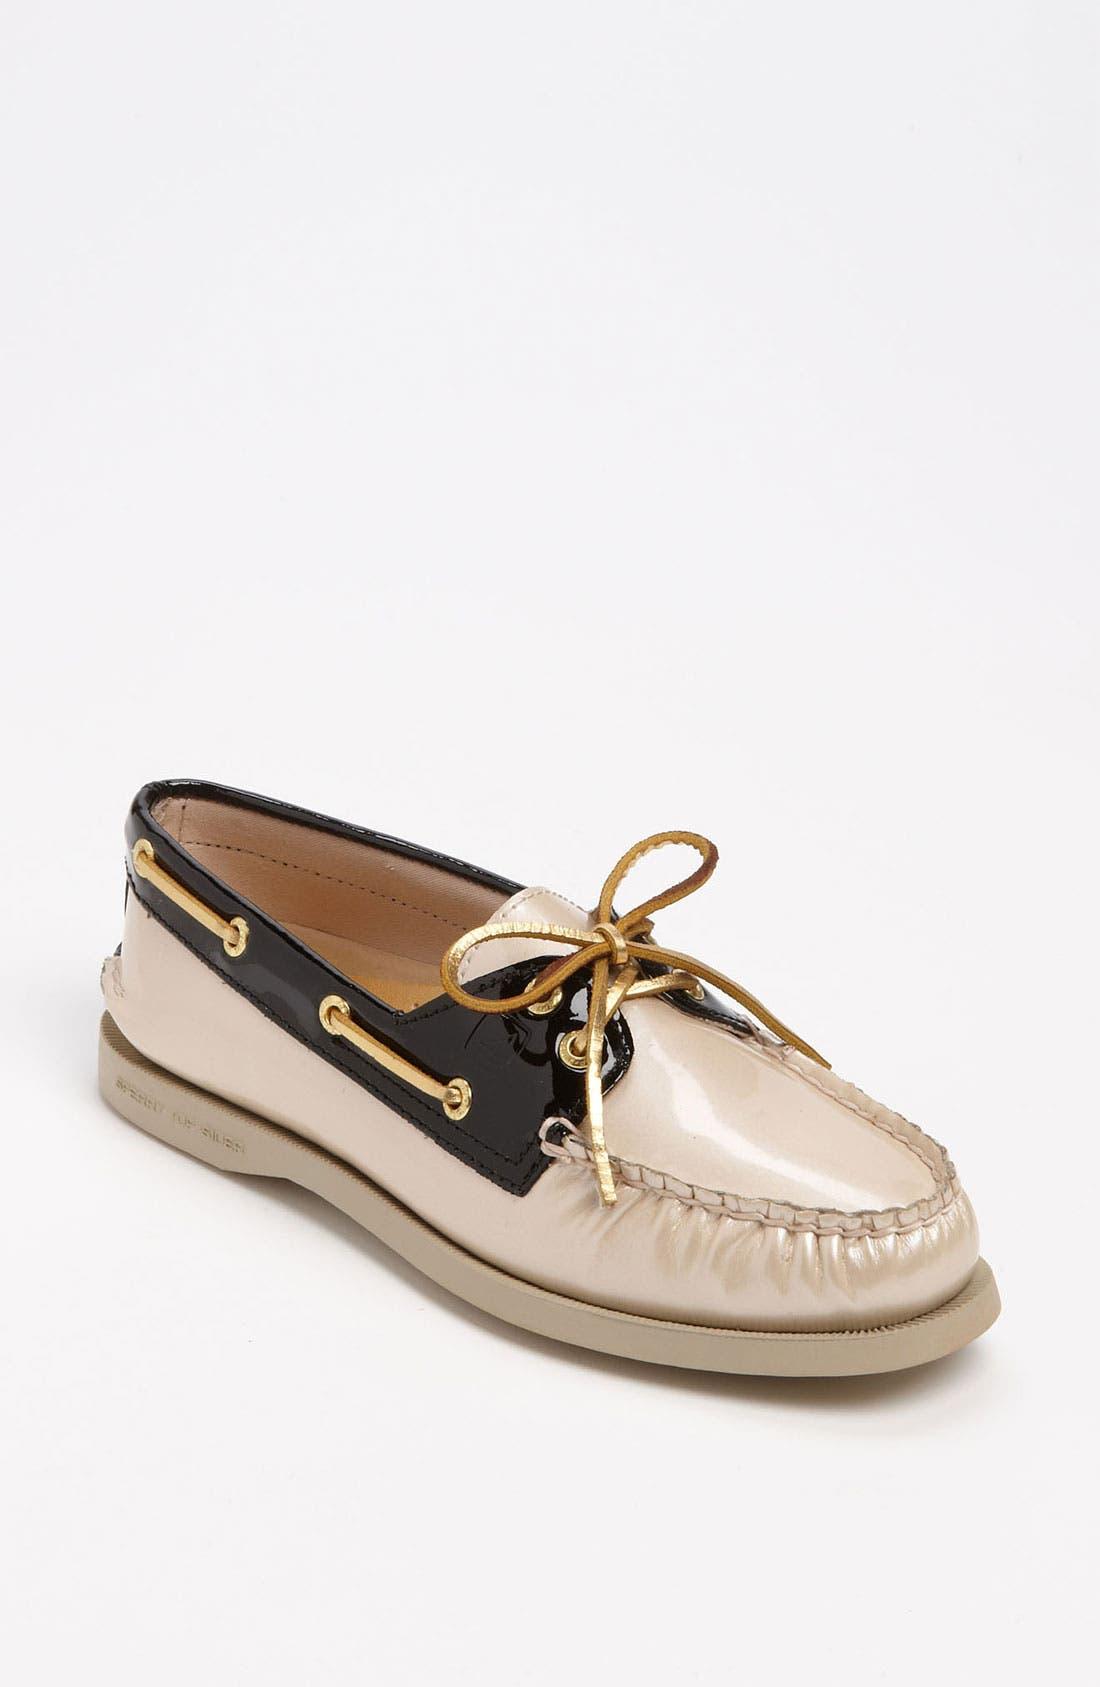 Main Image - Sperry 'Authentic Original' Boat Shoe (Women)